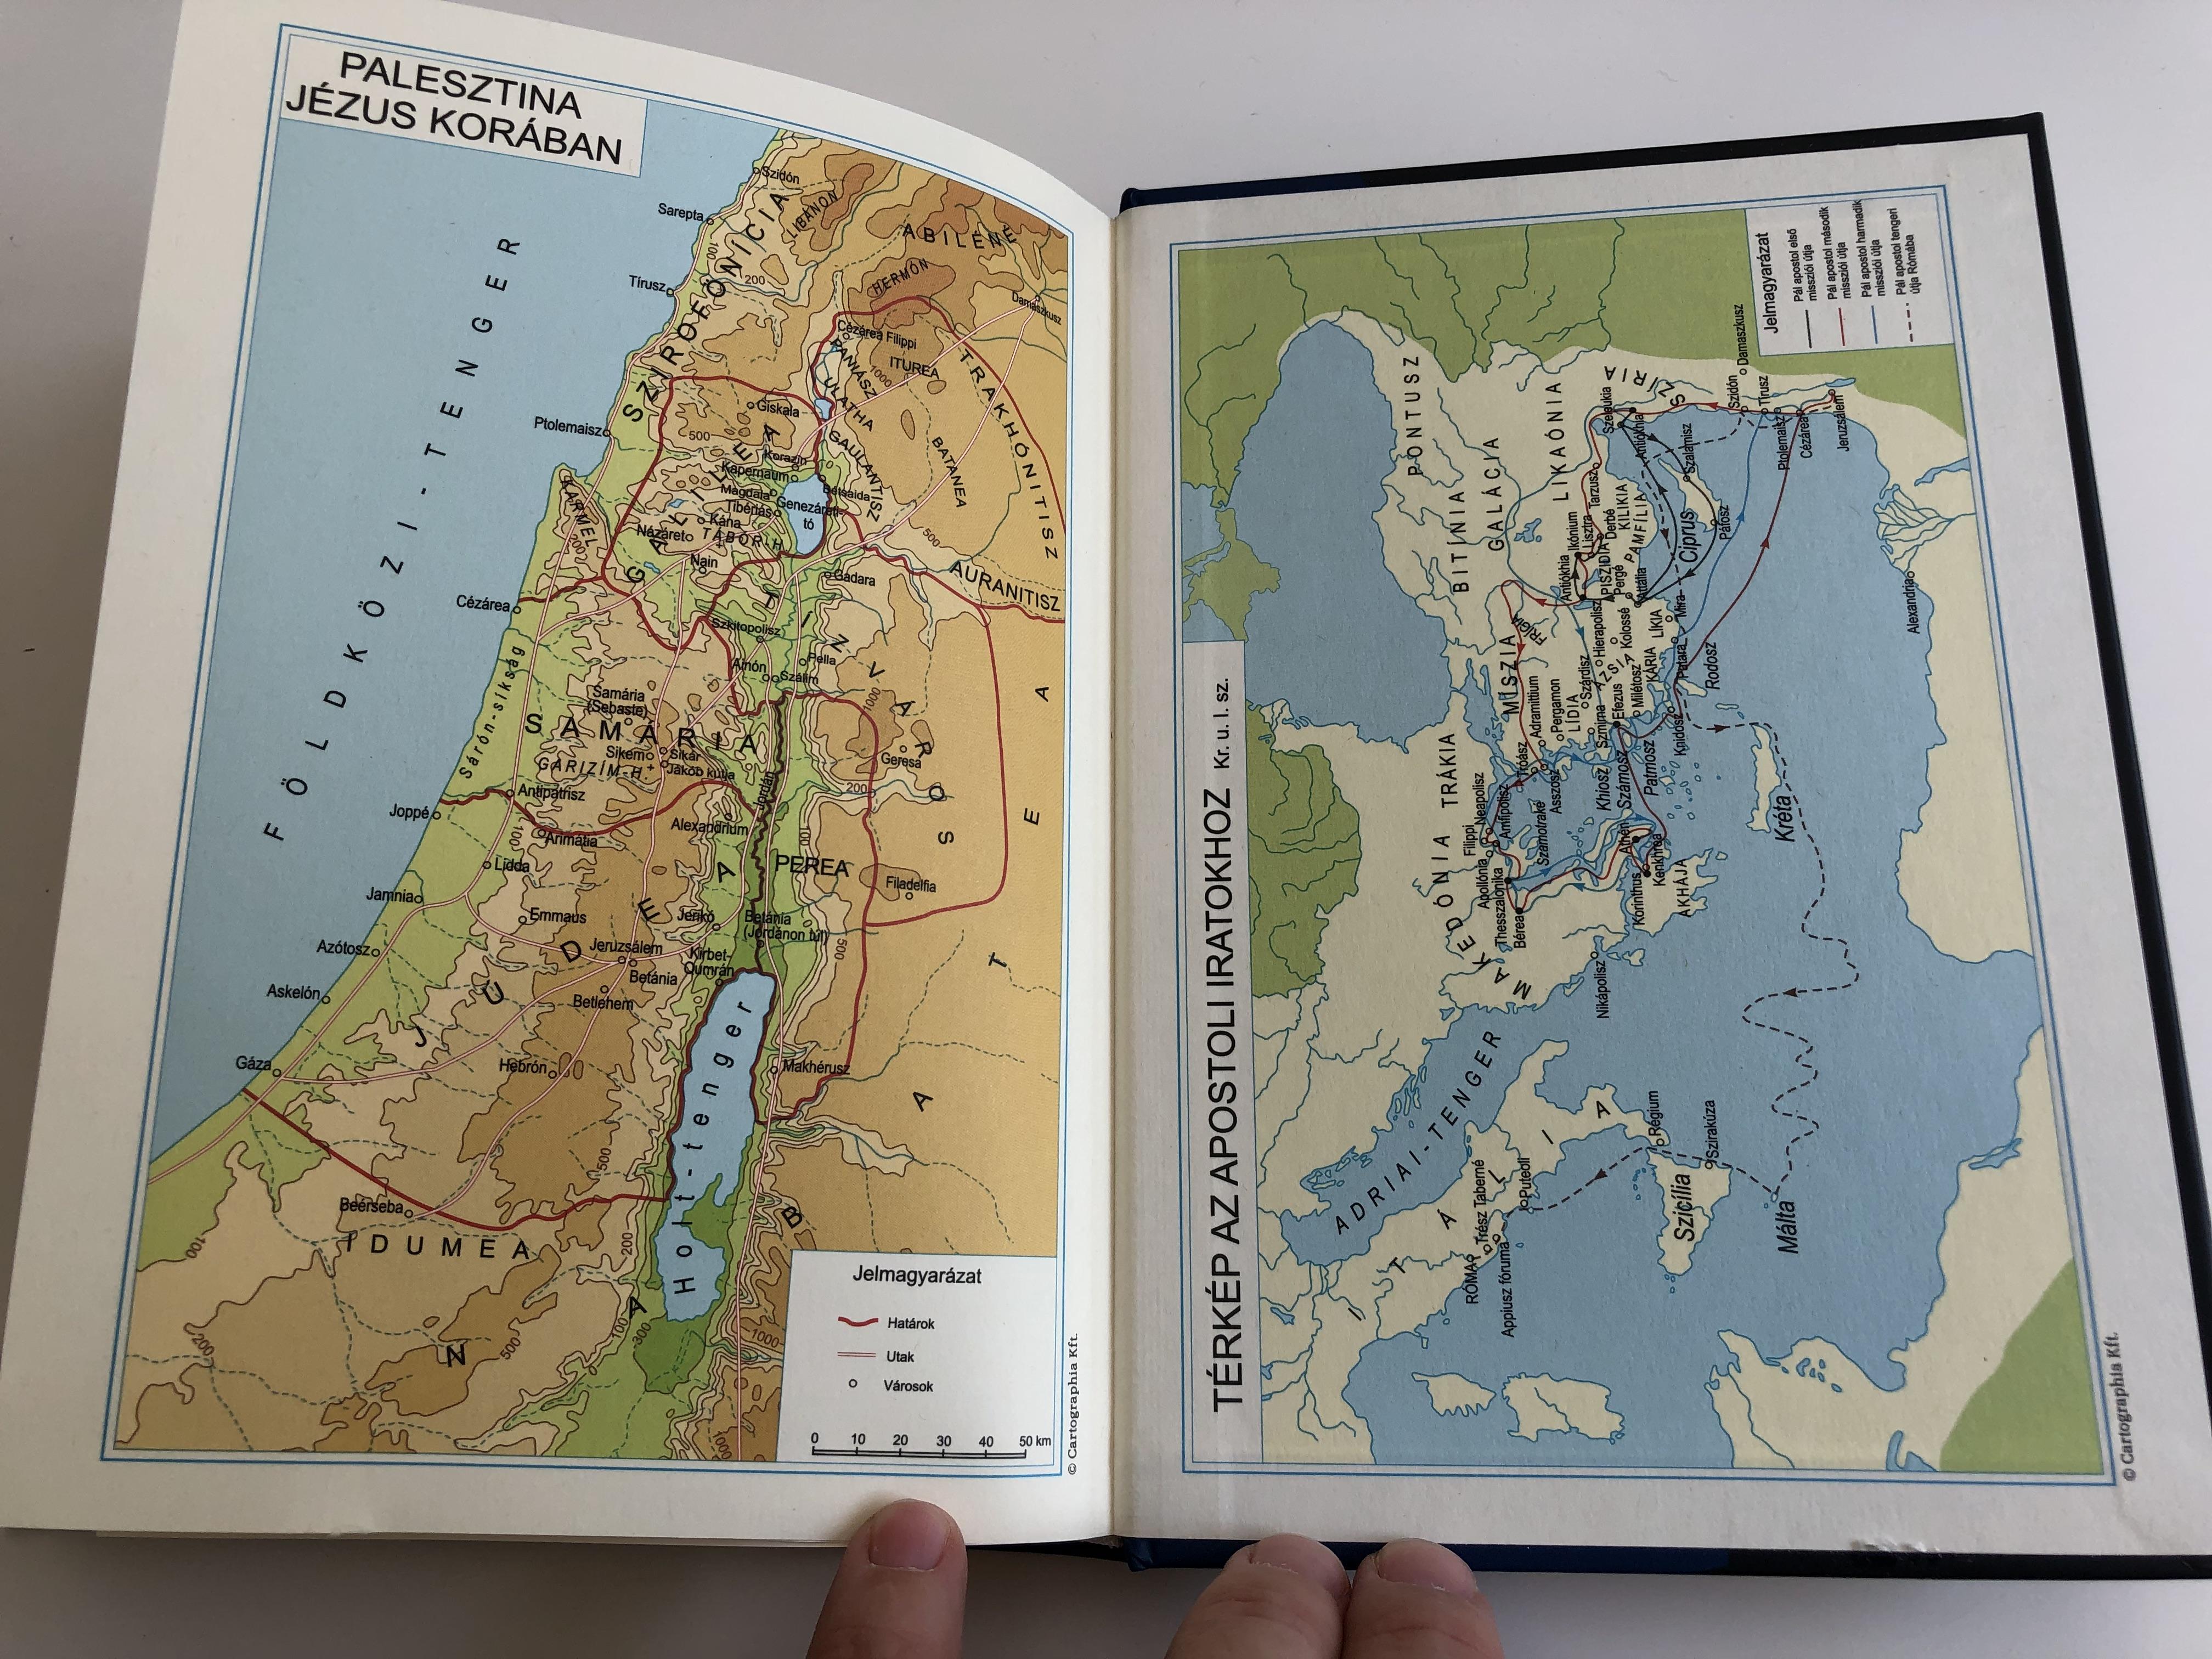 hungarian-protestant-bible-biblia-nagy-m-ret-kem-nyt-bl-s-hardcover-revide-lt-j-ford-t-s-r-f-2014-k-k-sz-nben-a5-size-14-.jpg